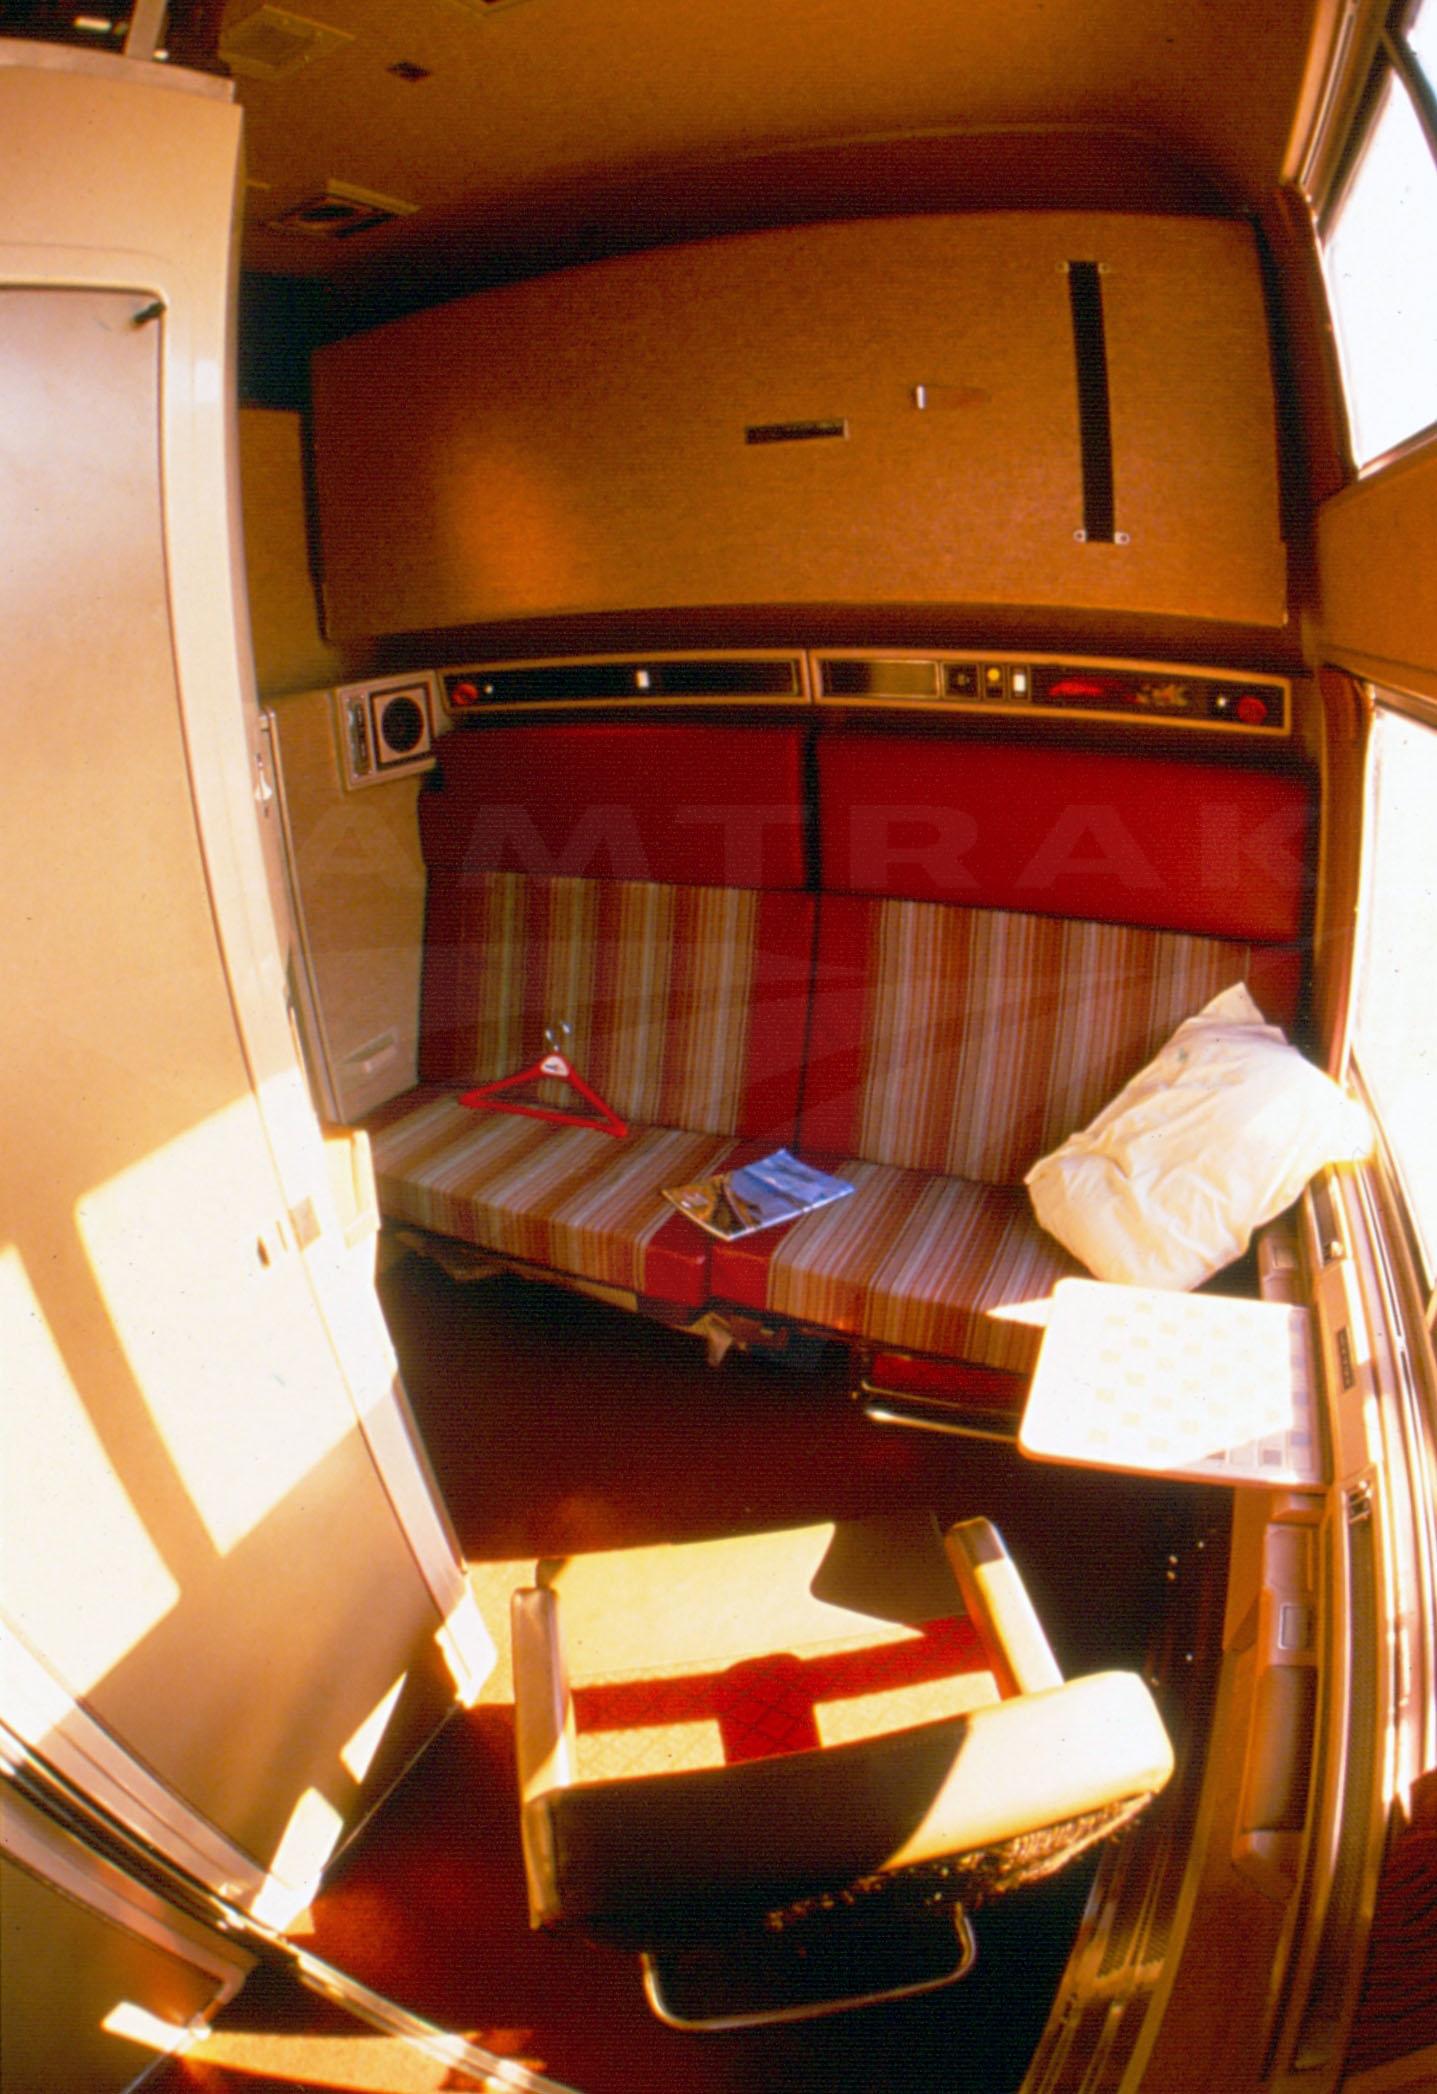 Prototype Viewliner Bedroom 1980s — Amtrak History of America's Railroad